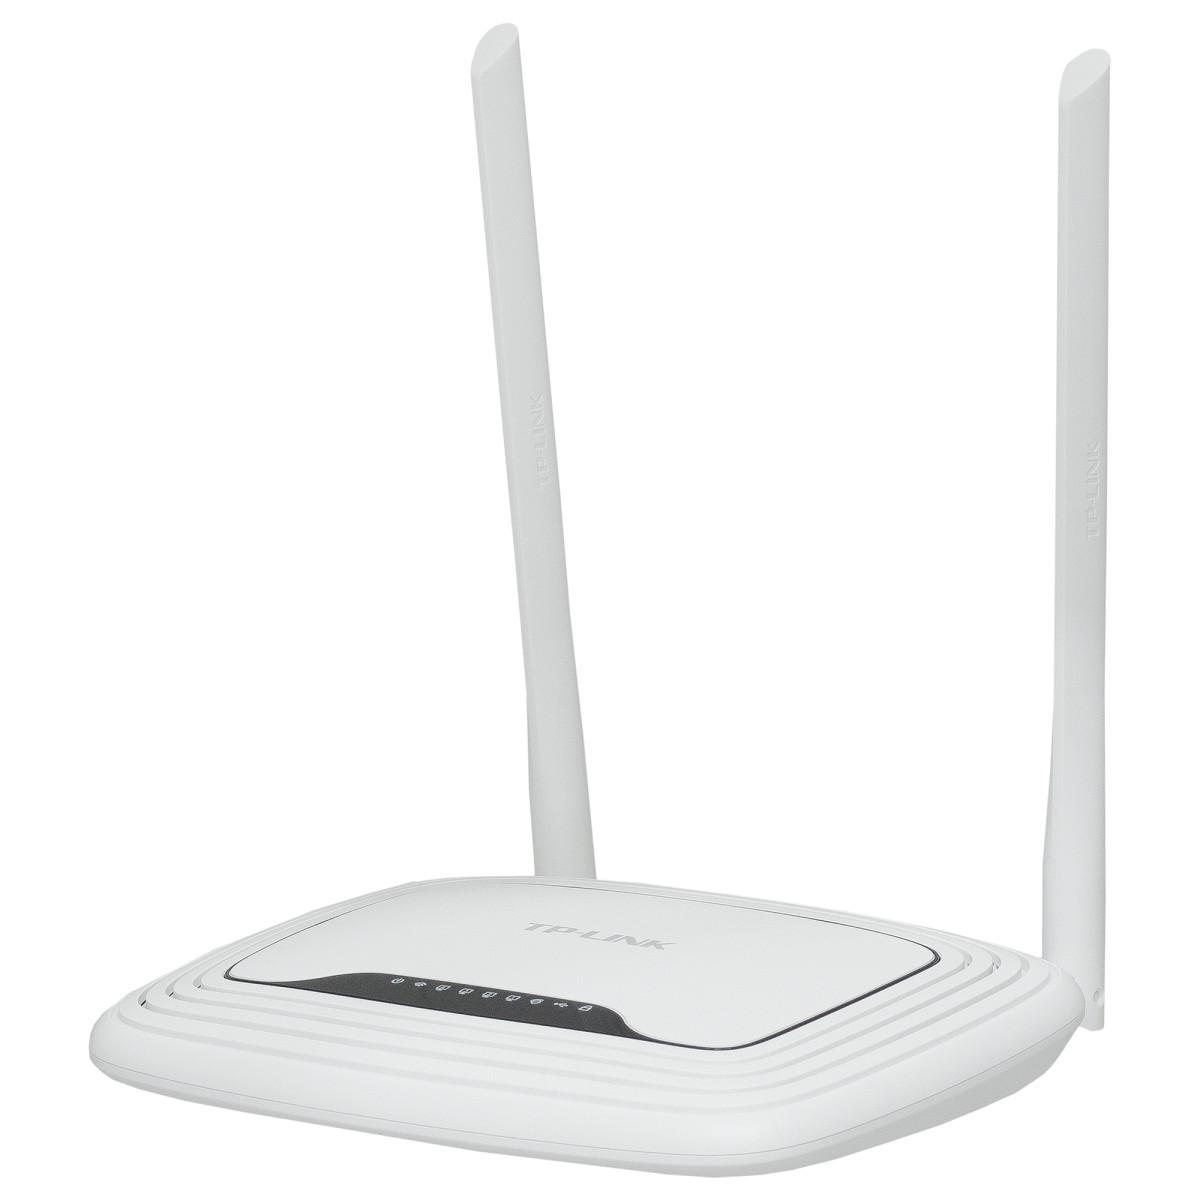 Wi-Fi роутер TP-LINK TL-WR842N 300 Мбит/с пластик цвет белый